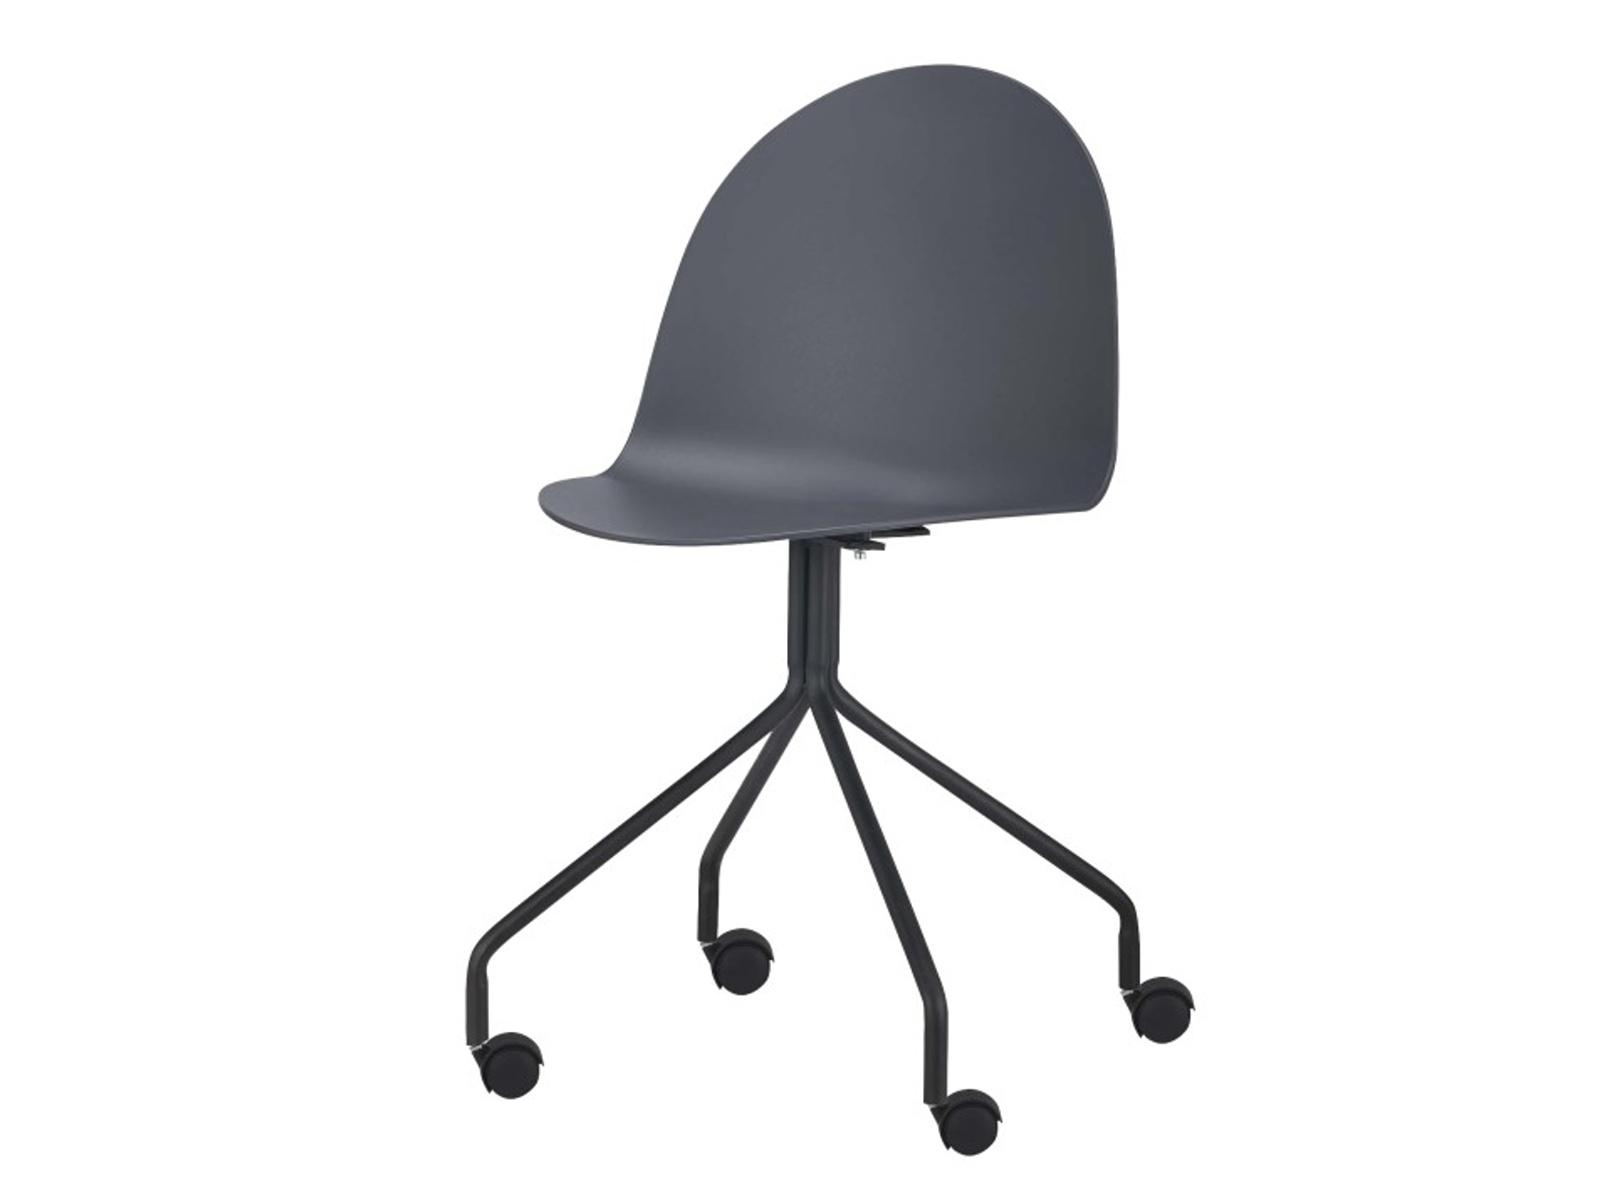 Židle BRUNA, tmavě šedá